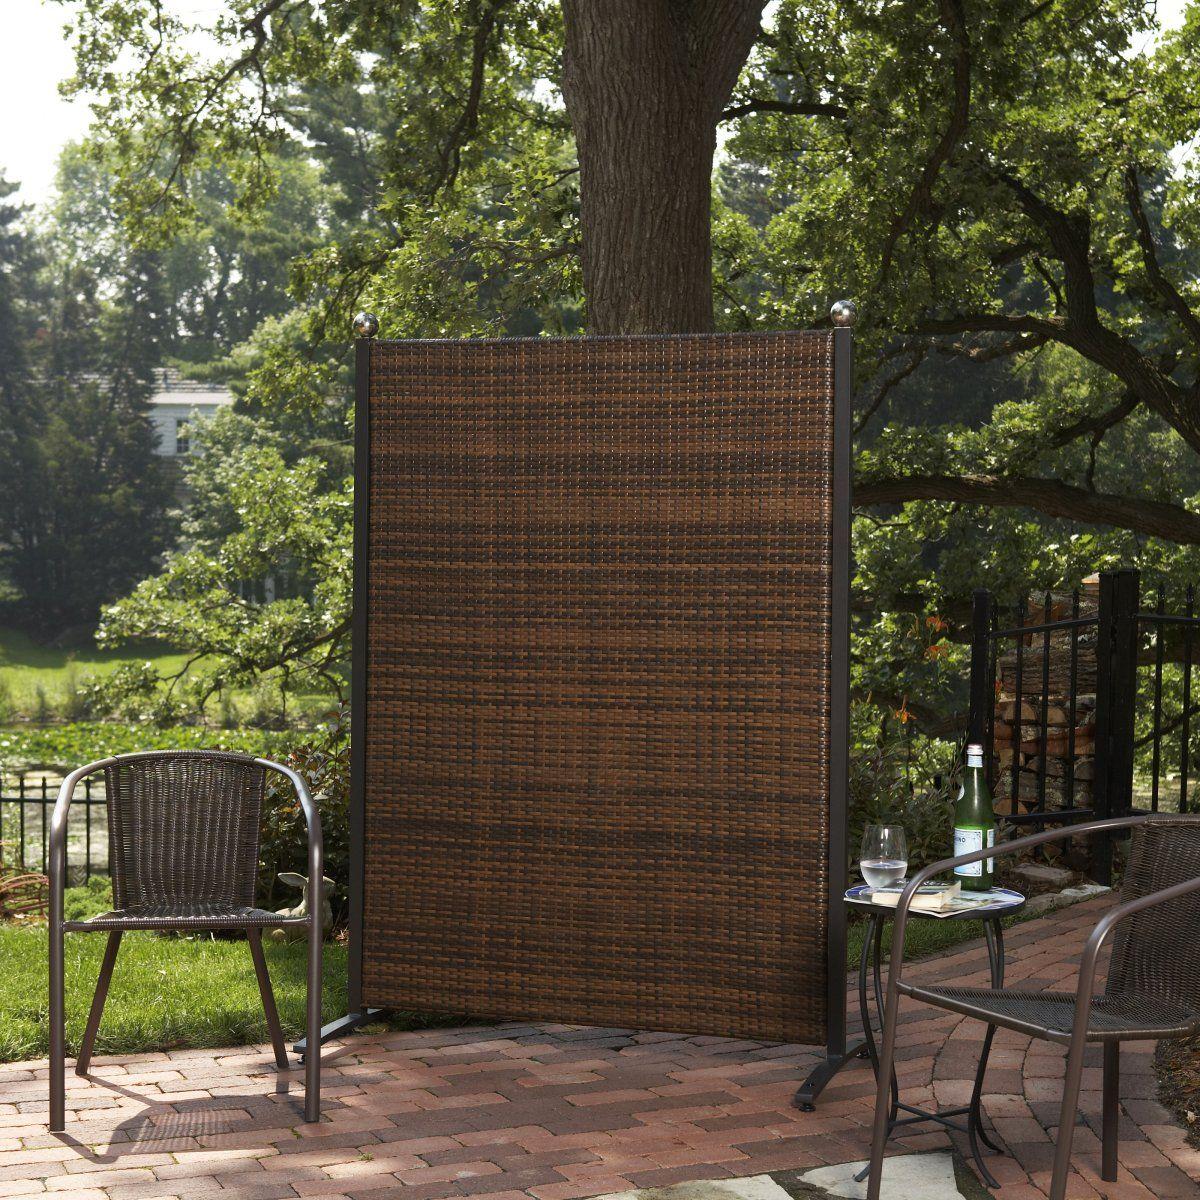 Versare outdoor wicker resin room divider outdoor privacy screens